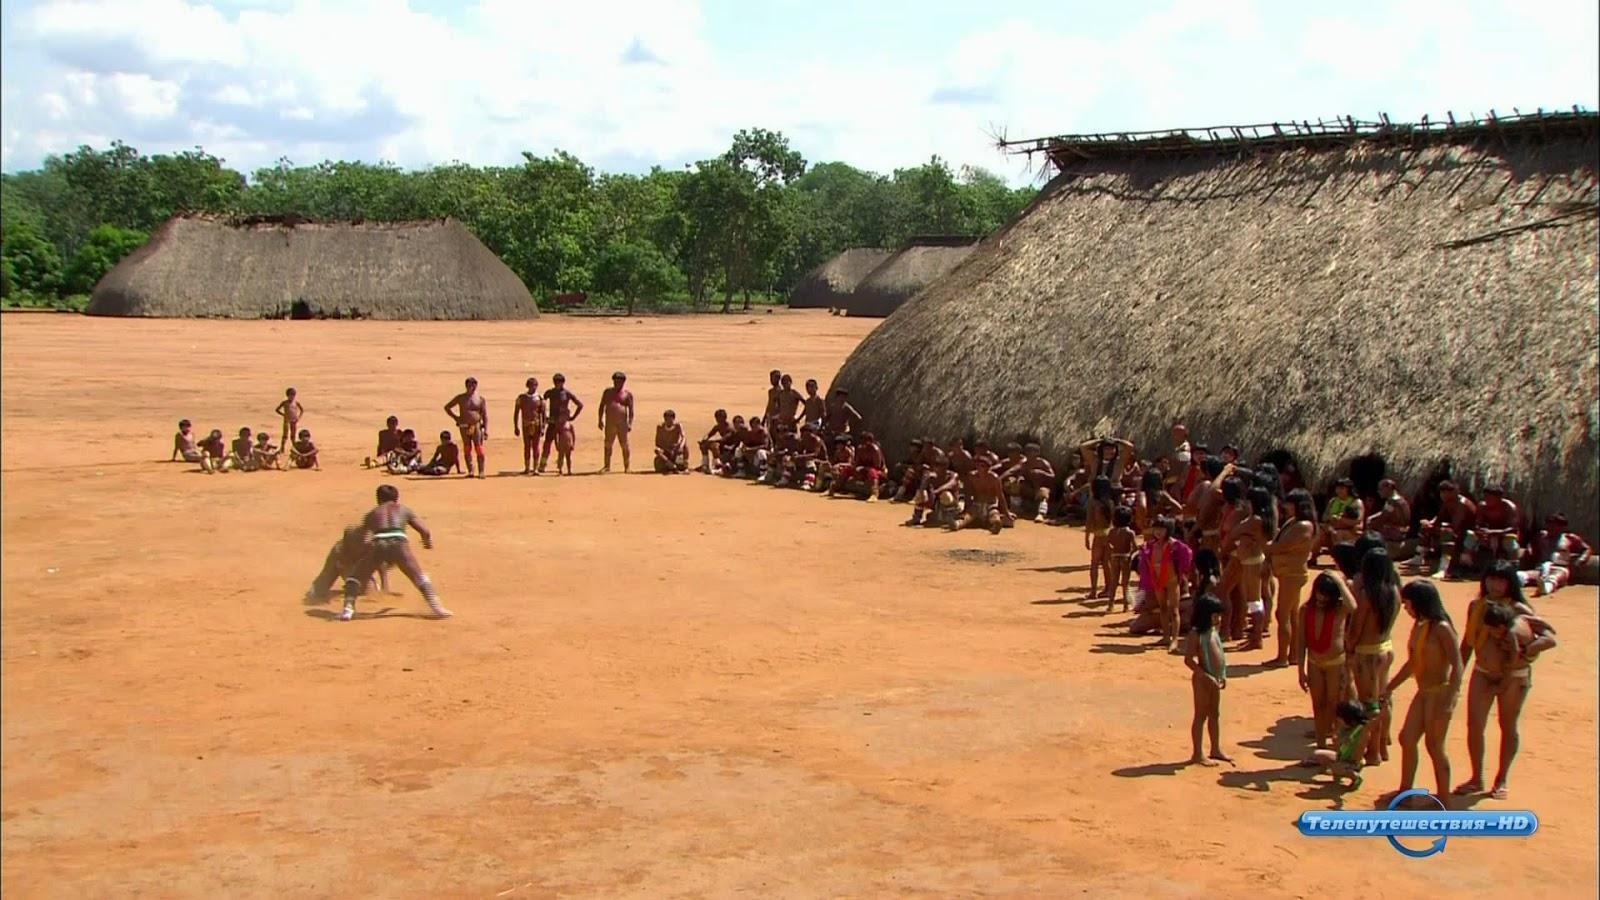 Исчезающая Амазонка - Потерянный рай / Disappearing Amazon. Paradise Lost. 2010. Full HD.